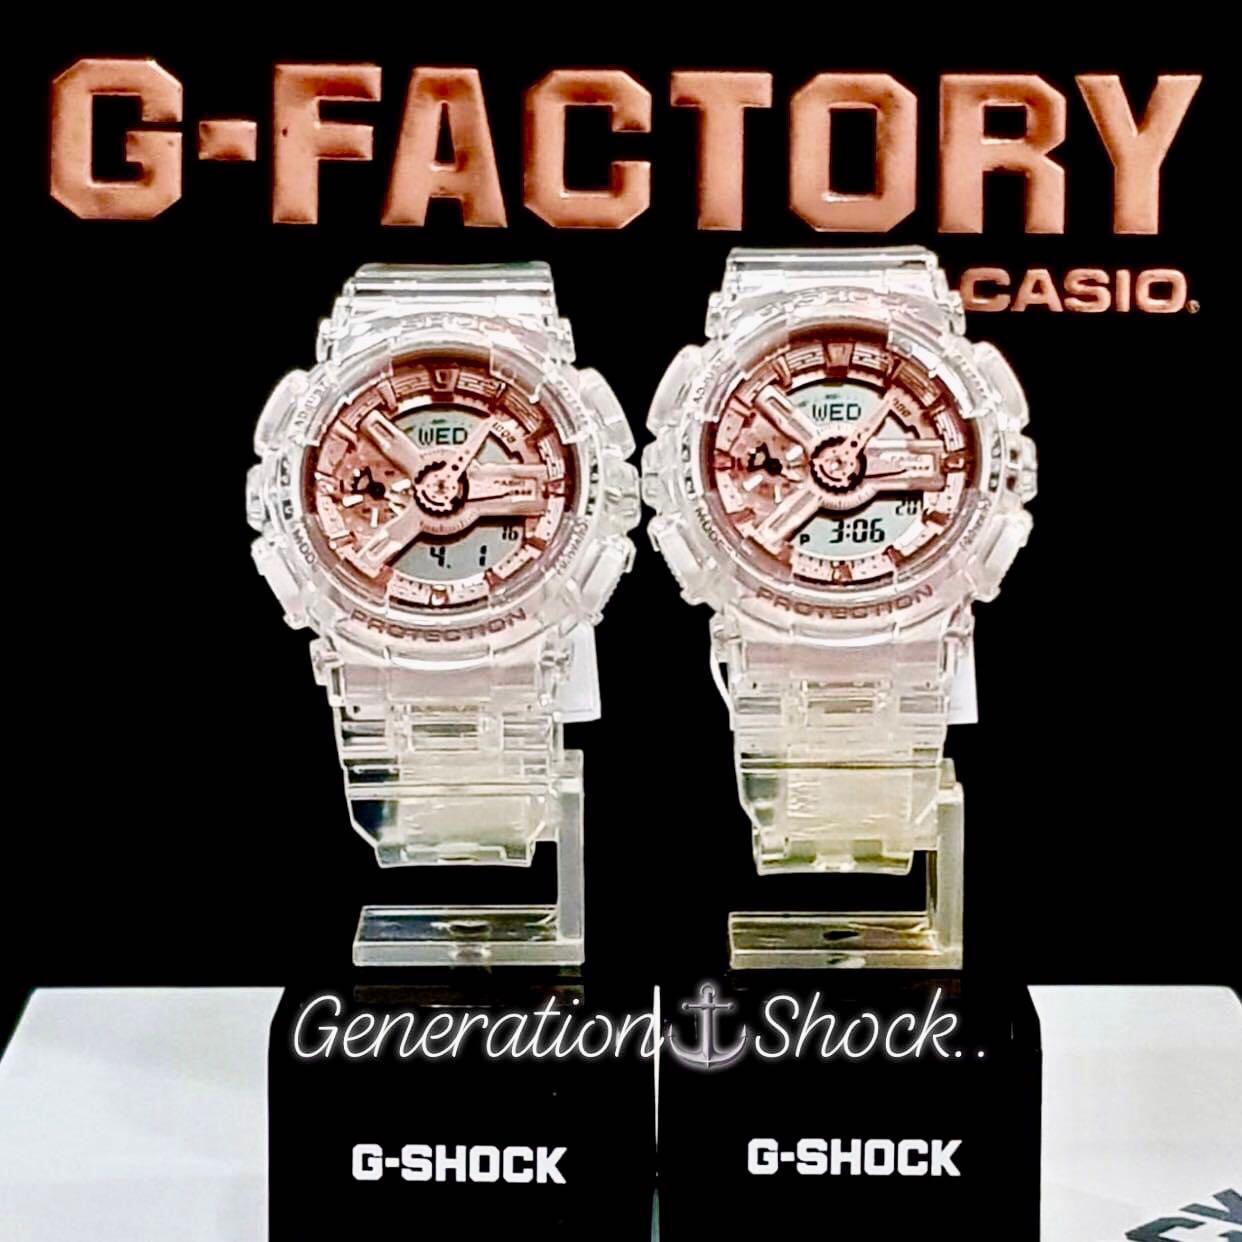 NEW🌟COUPLE💝SET : BABYG + GSHOCK DIVER UNISEX SPORTS WATCH  : 100% ORIGINAL AUTHENTIC CASIO BABY-G-SHOCK : GMA-S110SR-7A + GMA-S110SR-7ADR